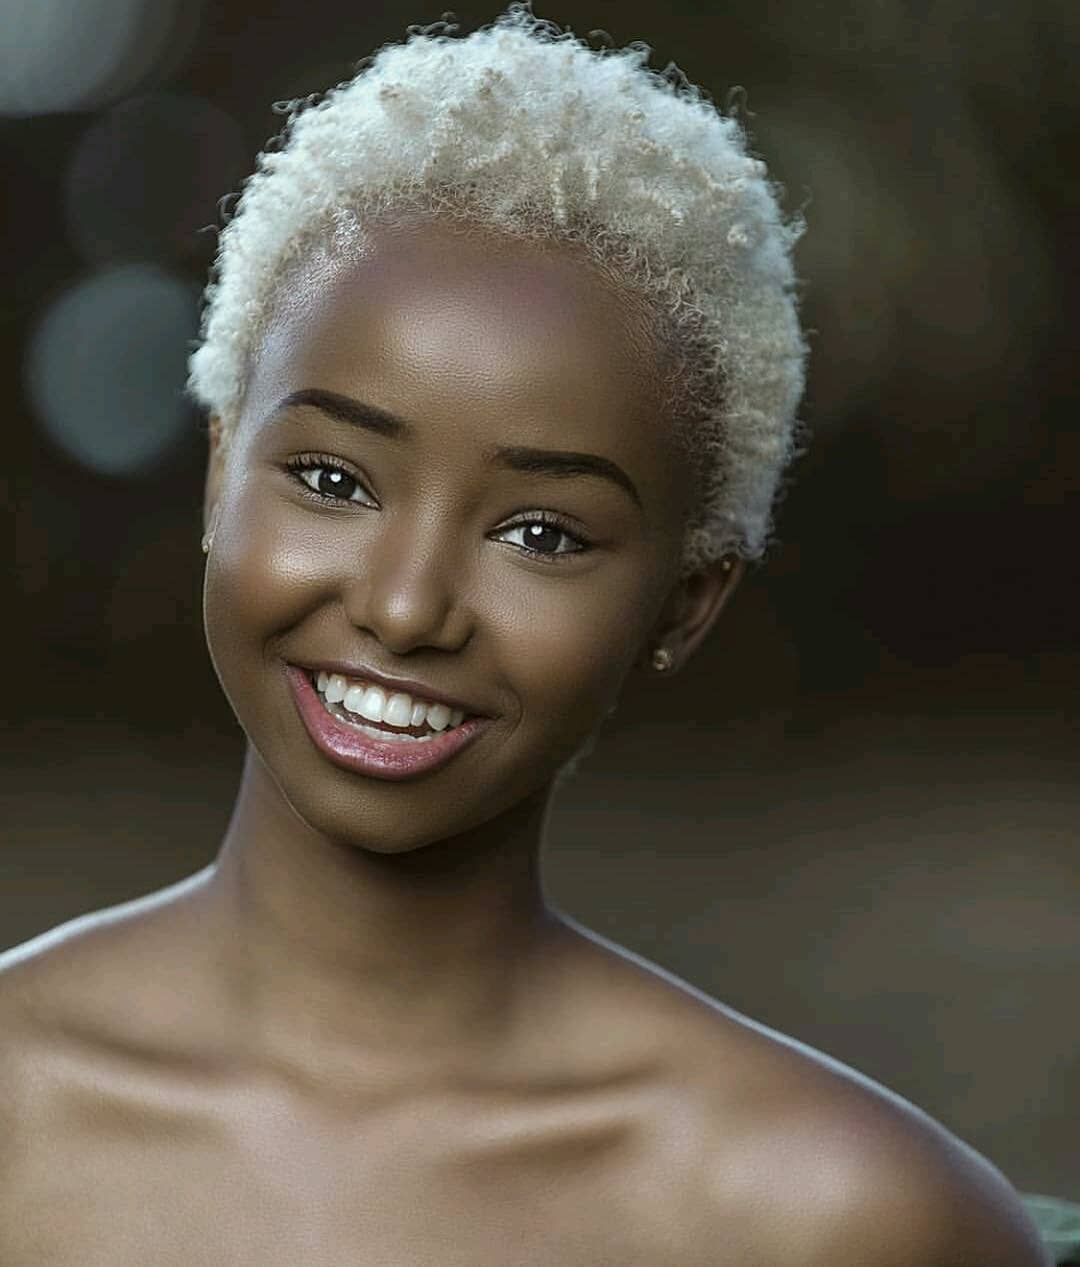 African Fashion On Instagram Melanin Natural Hair Styles Blonde Hair Black Girls Melanin Beauty